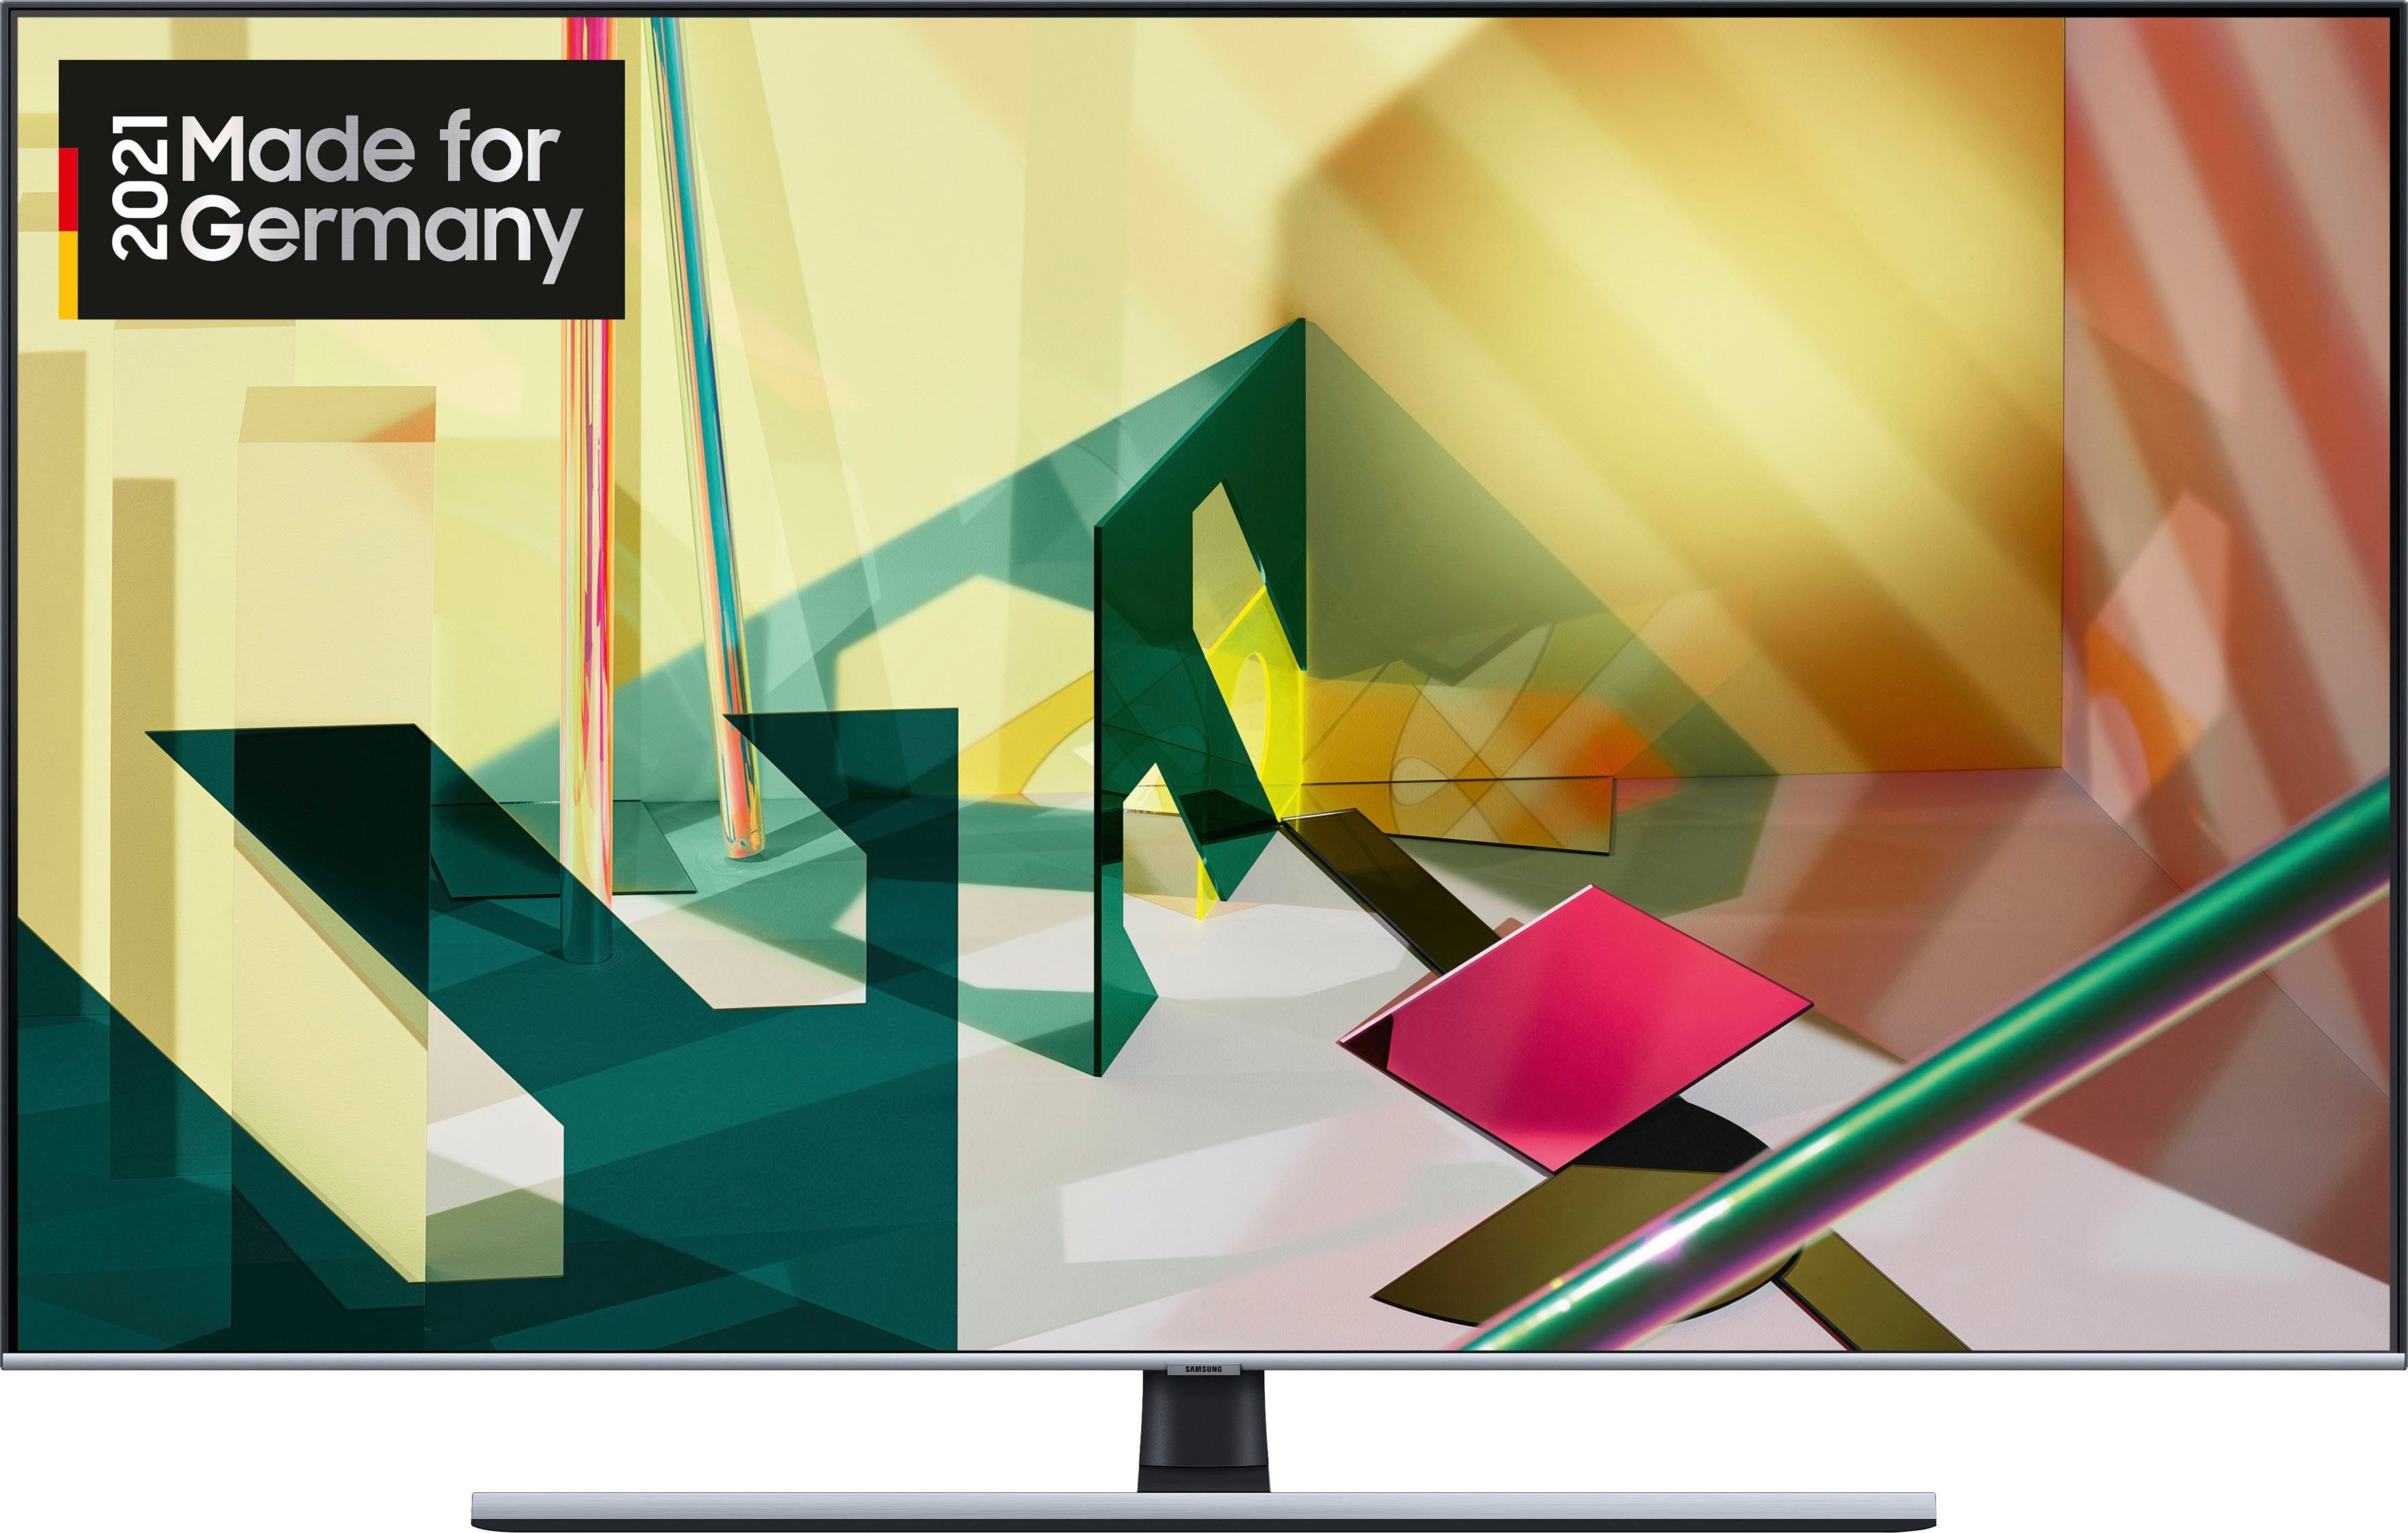 samsung gq75q75tgt qled fernseher 189 cm 75 zoll 4k ultra hd smart tv